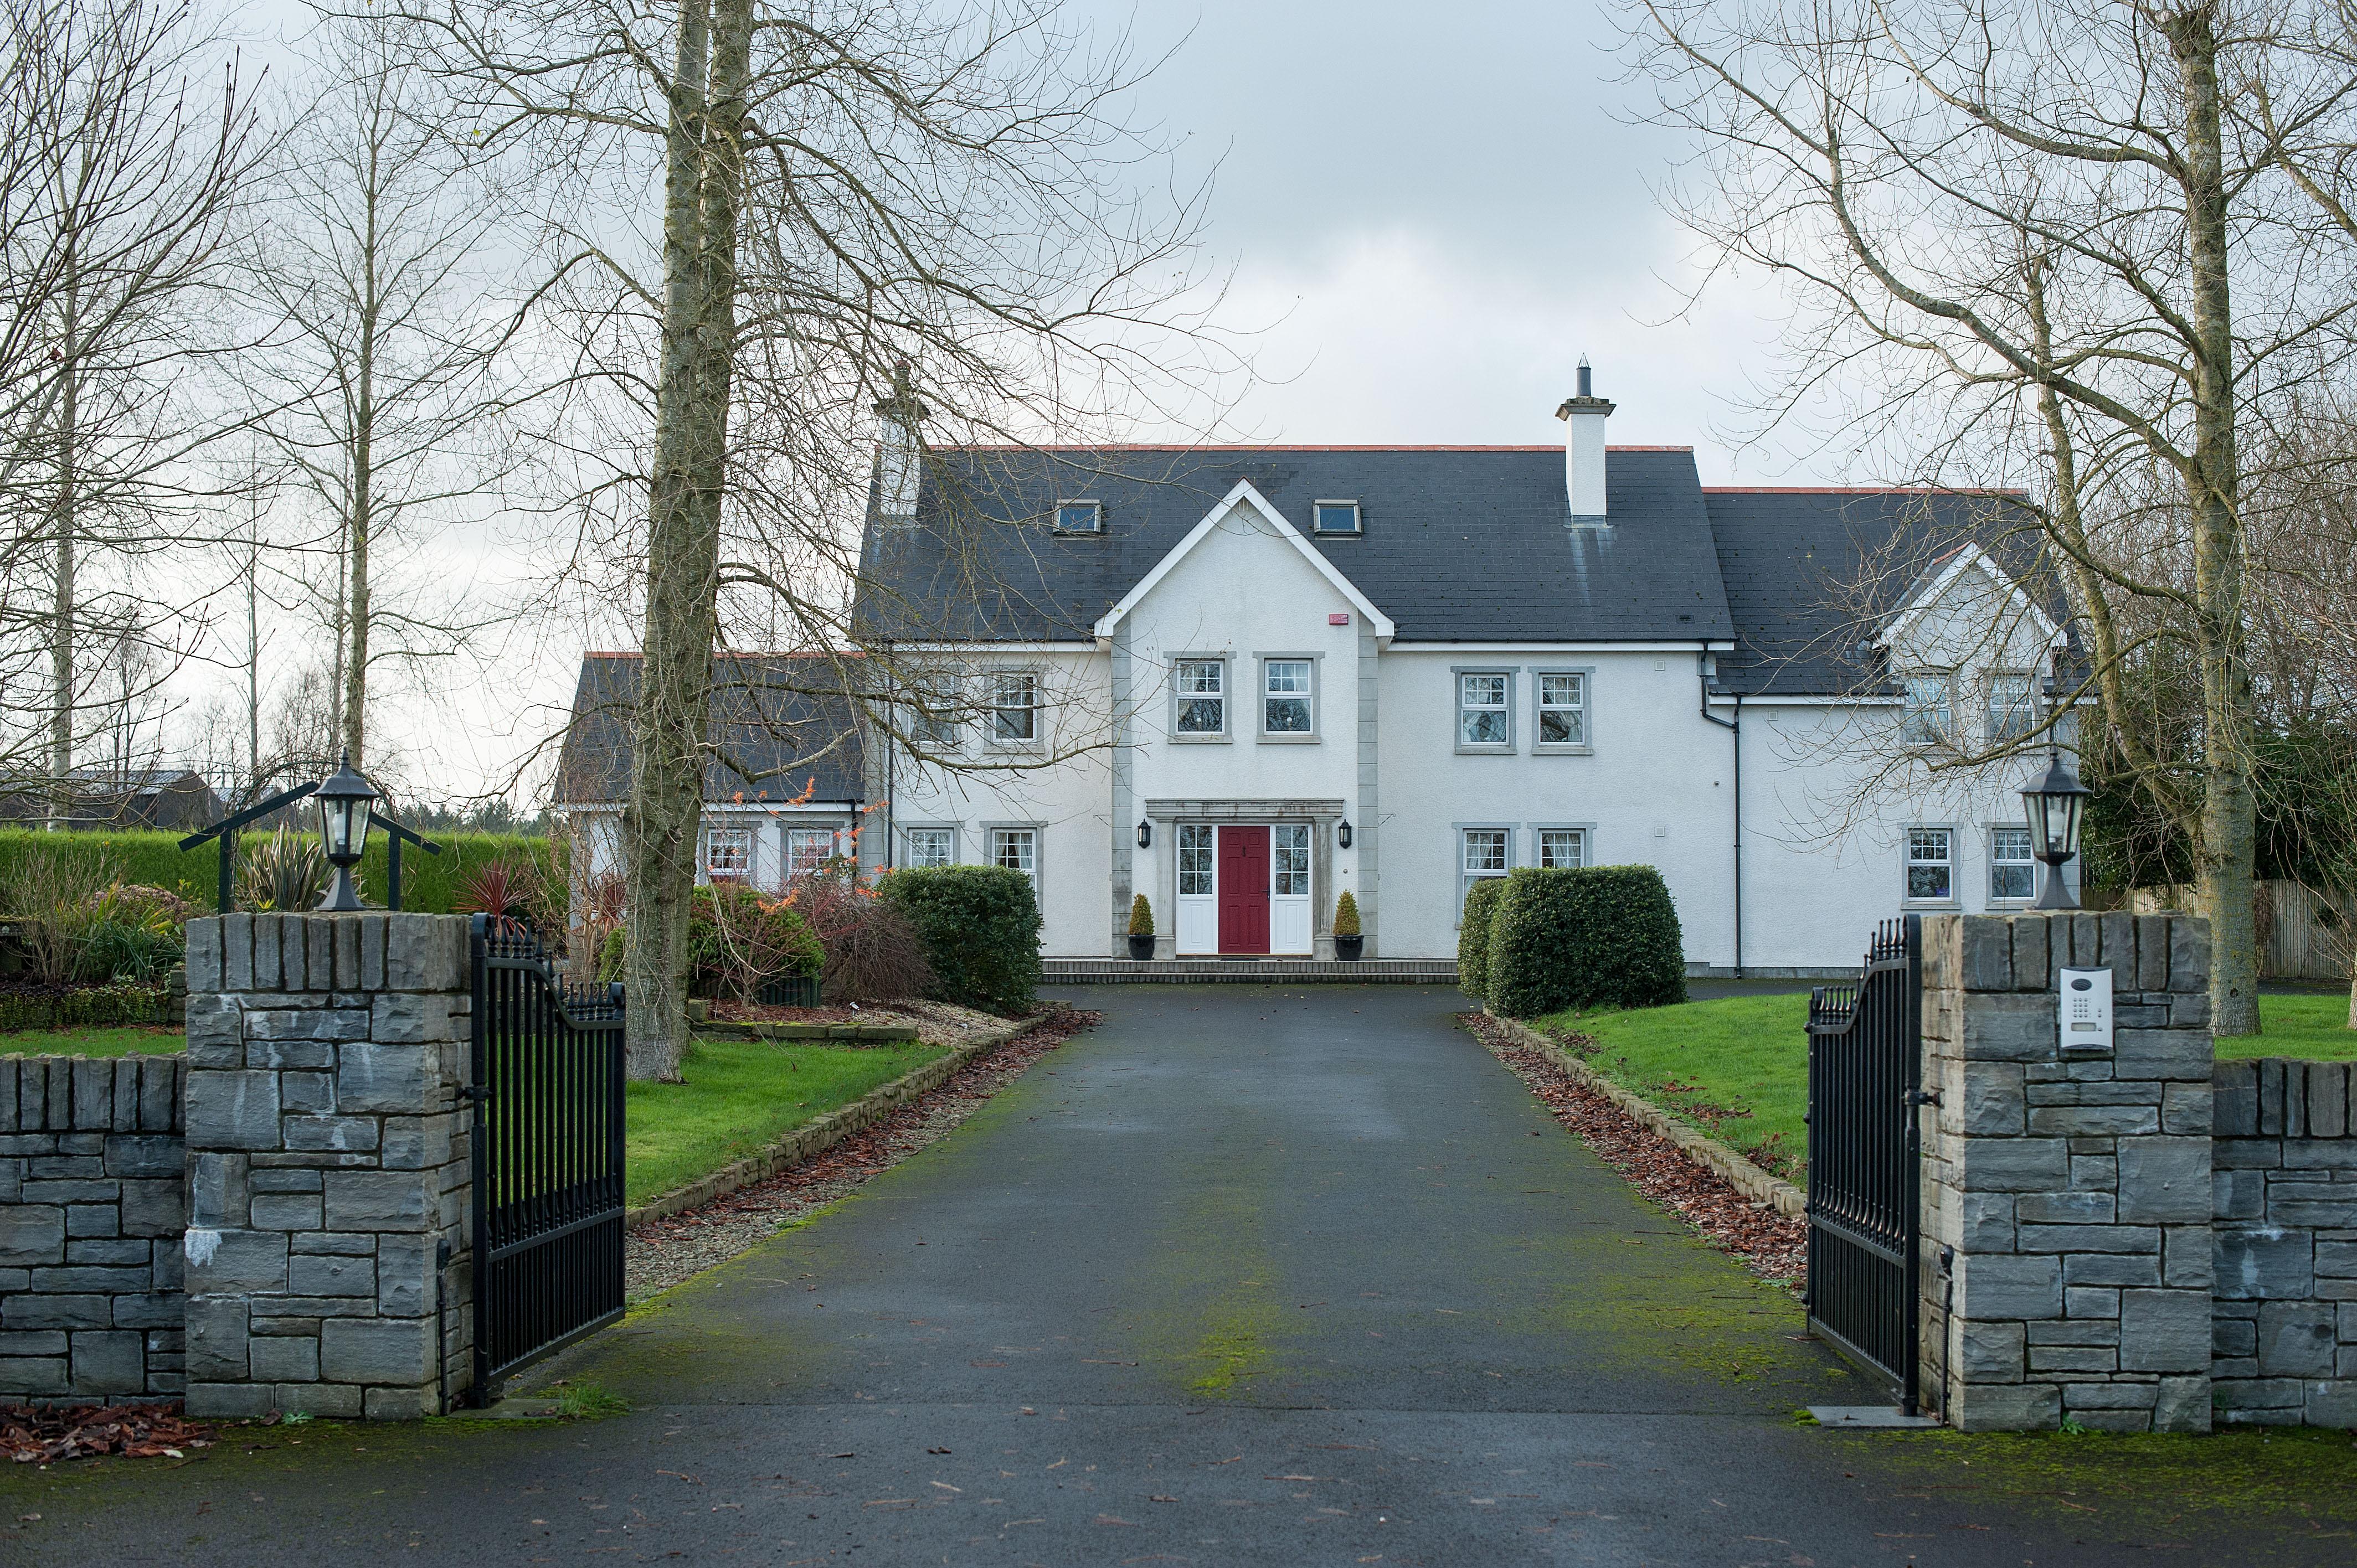 Ulster University research reveals a slowdown in Northern Ireland housing market